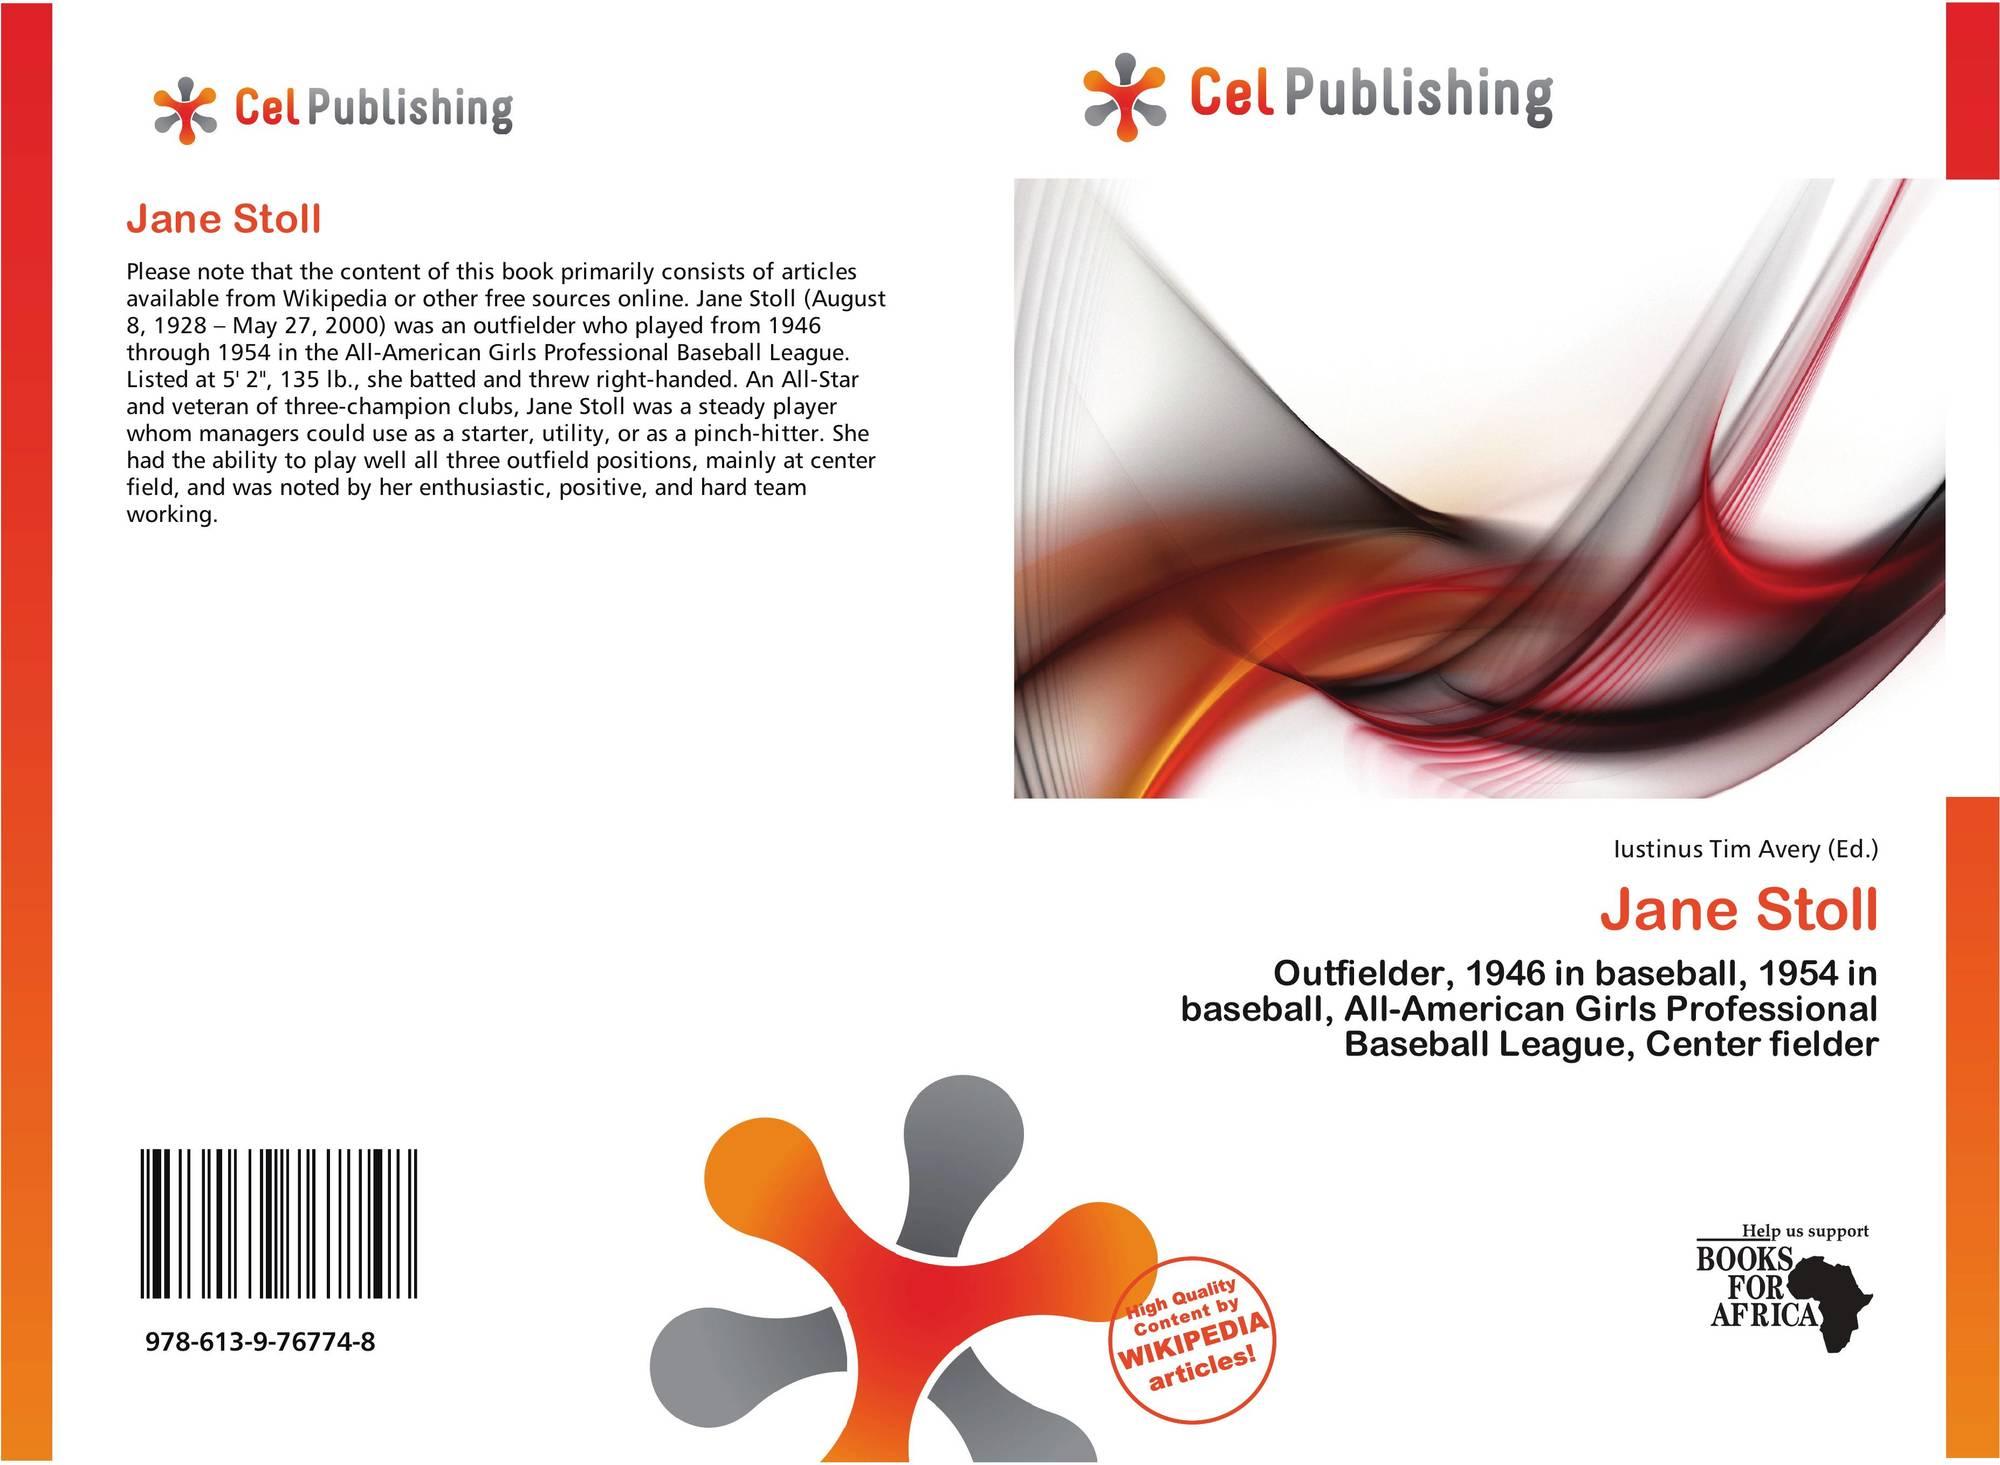 Communication on this topic: Jessica Clarke NZL 2011, qorianka-kilcher/